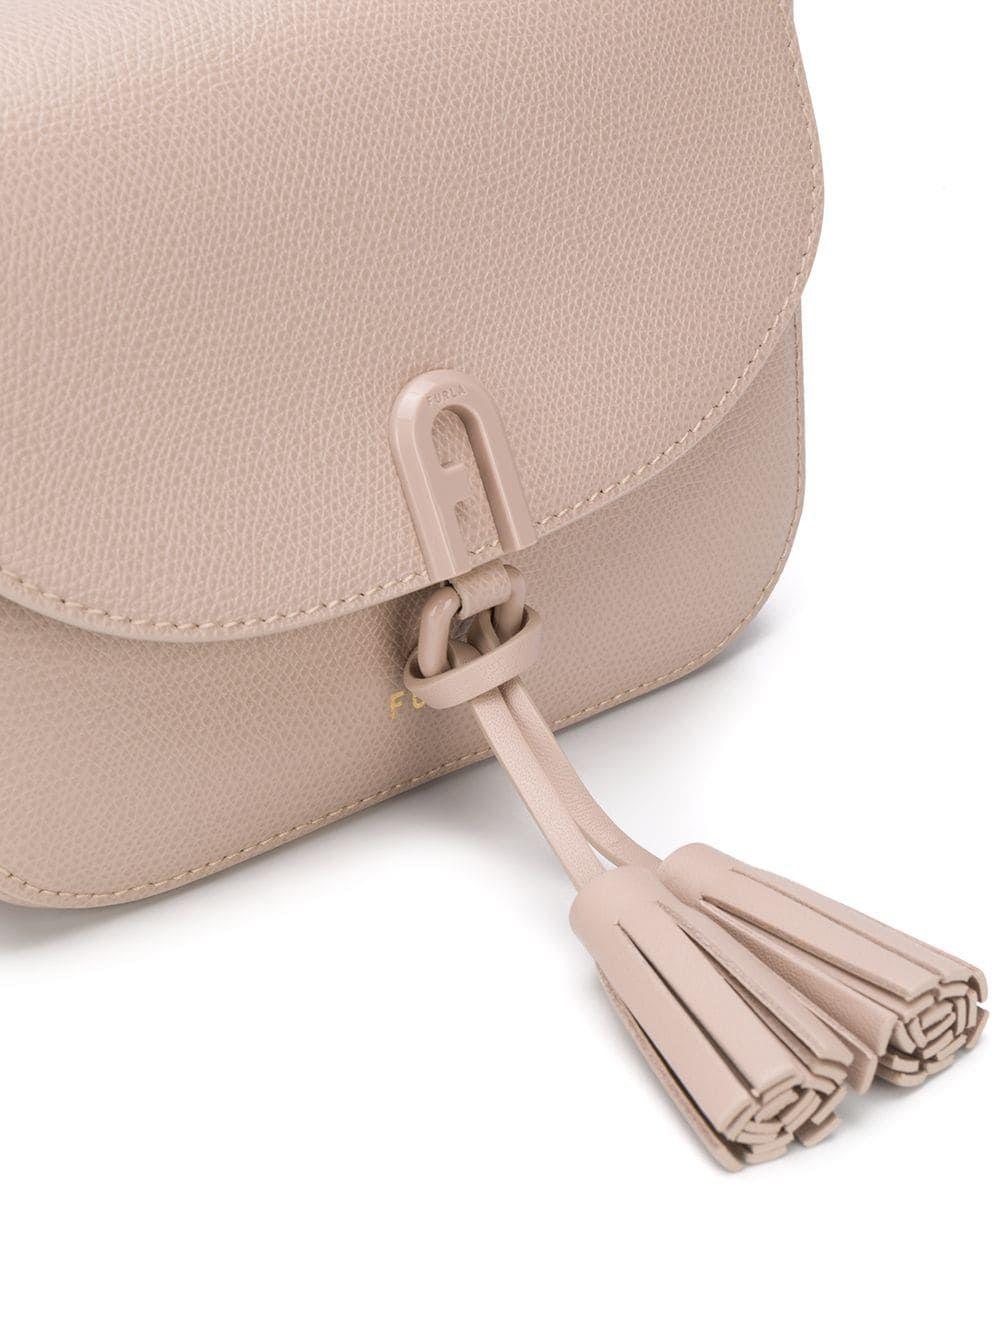 FURLA WOMEN'S 1065196 BEIGE LEATHER SHOULDER BAG